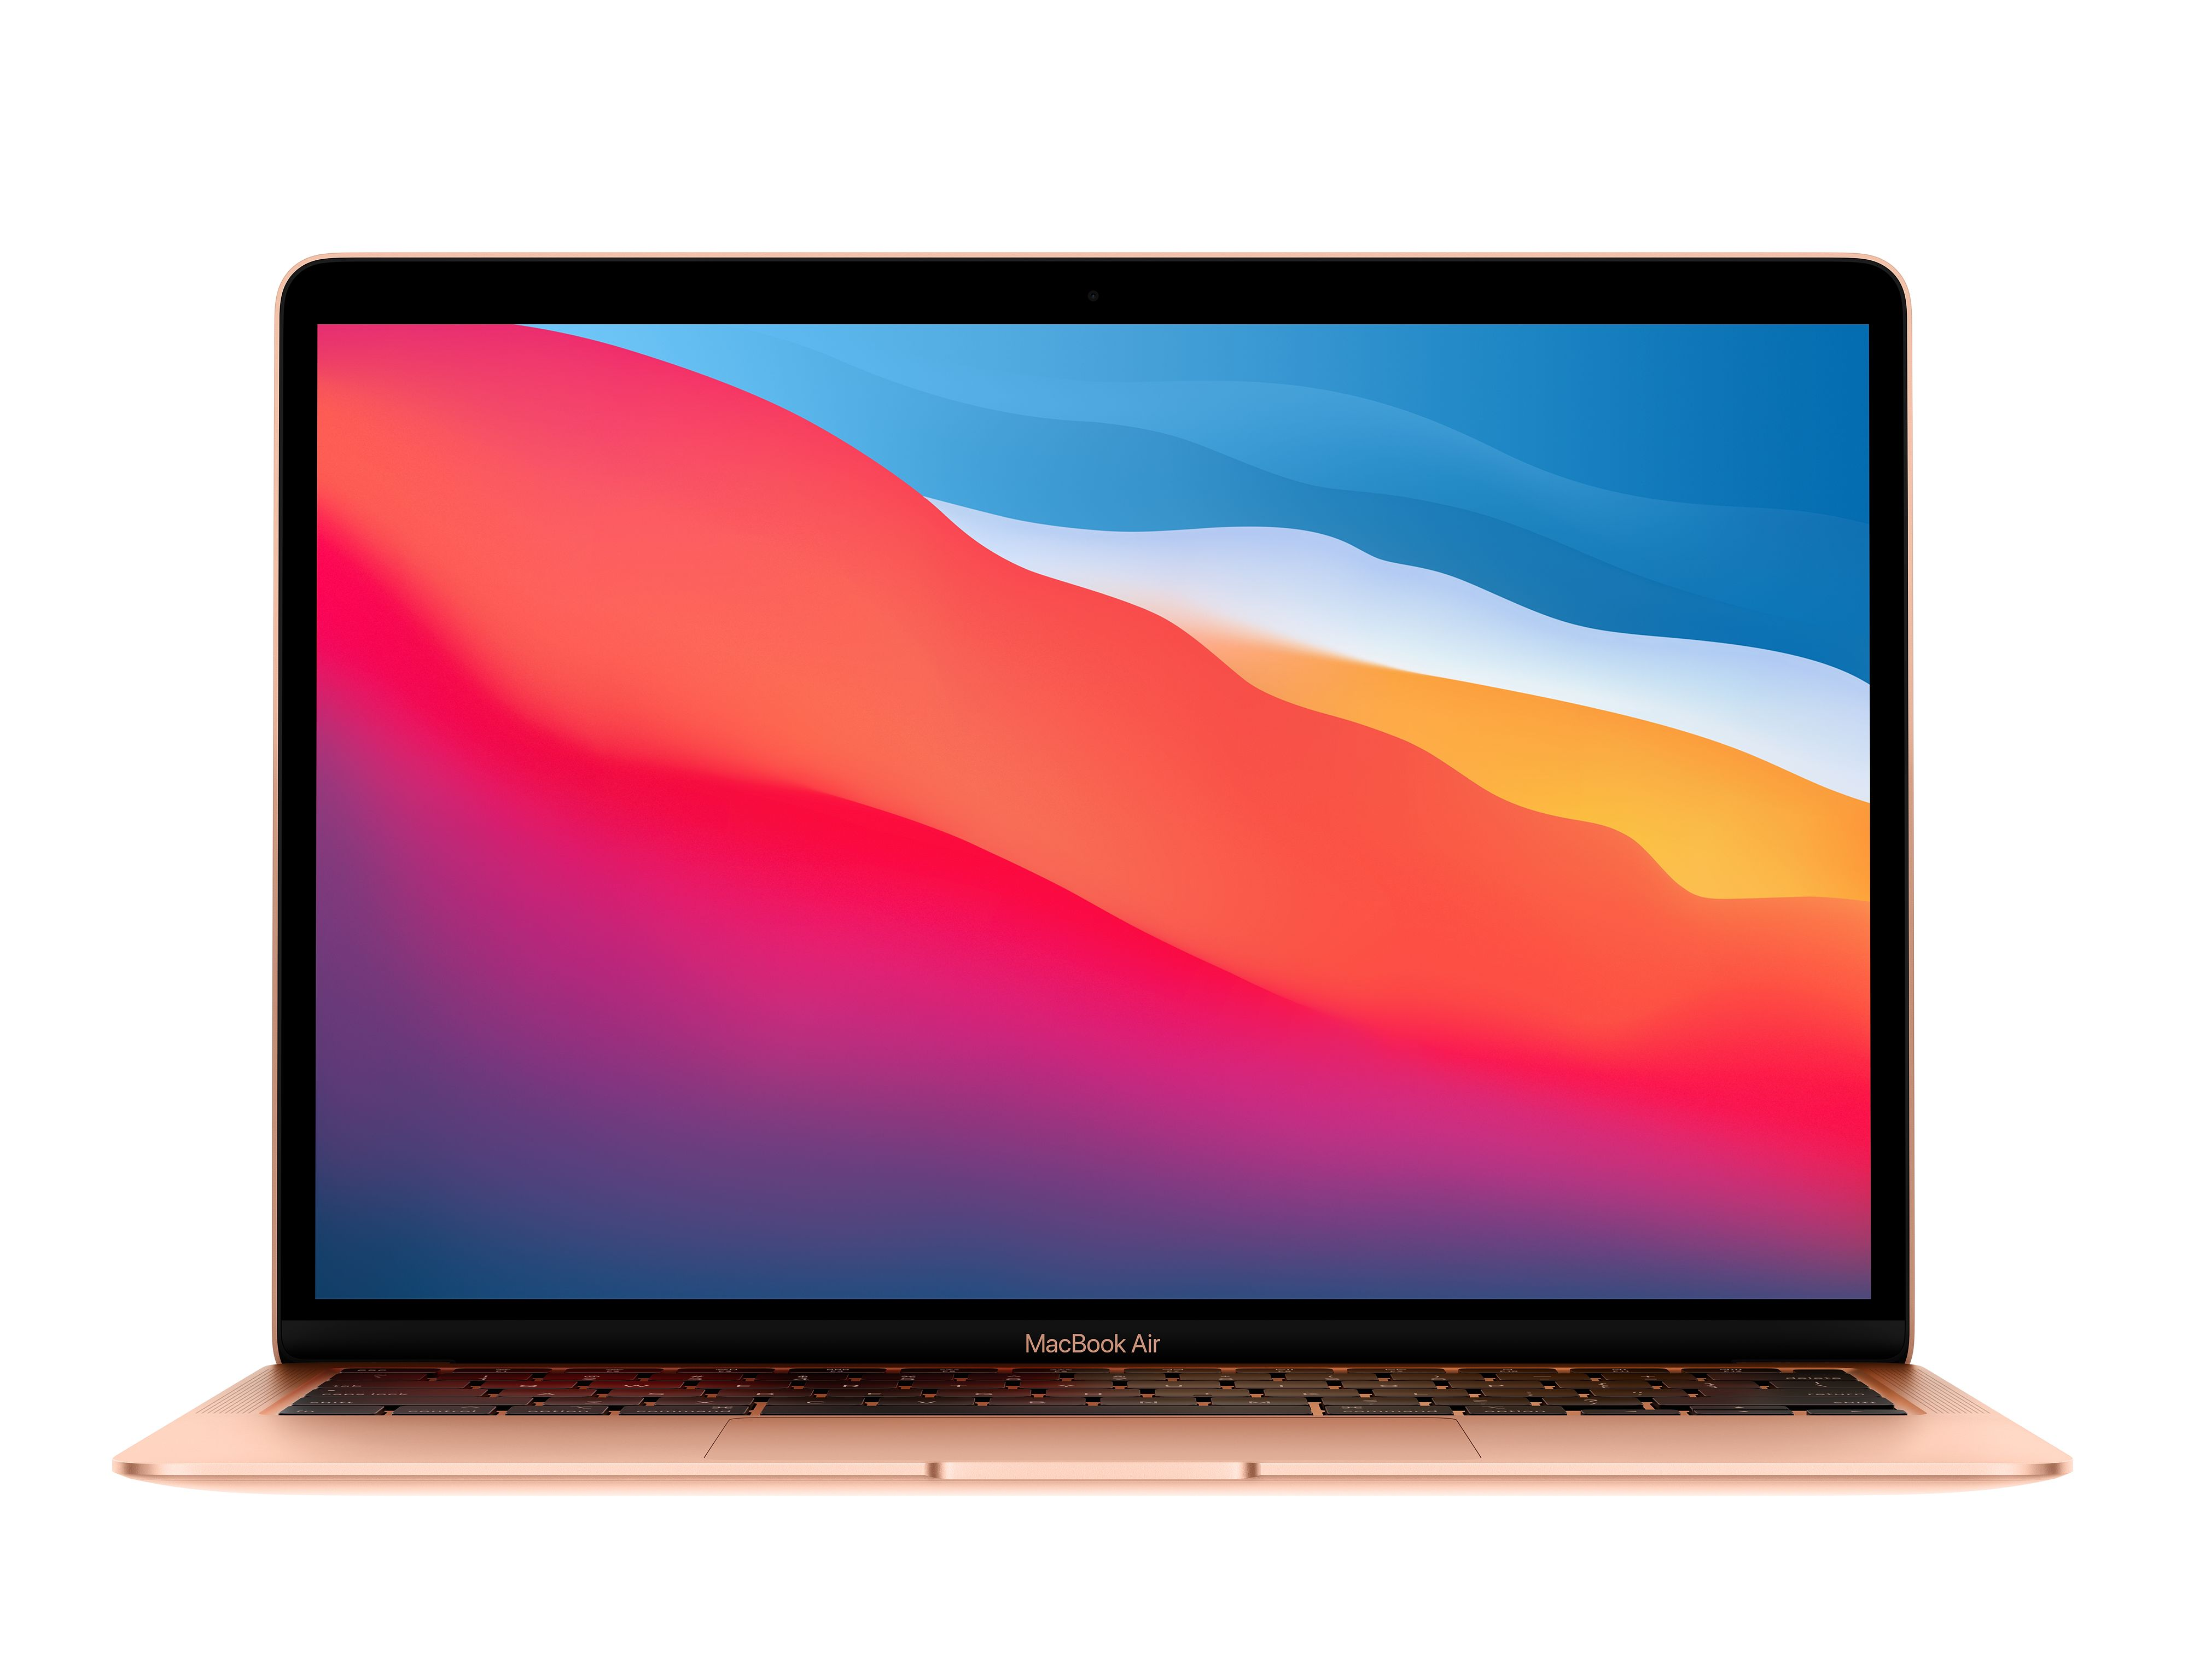 ram8-macbook-air-m1-2020-256gb